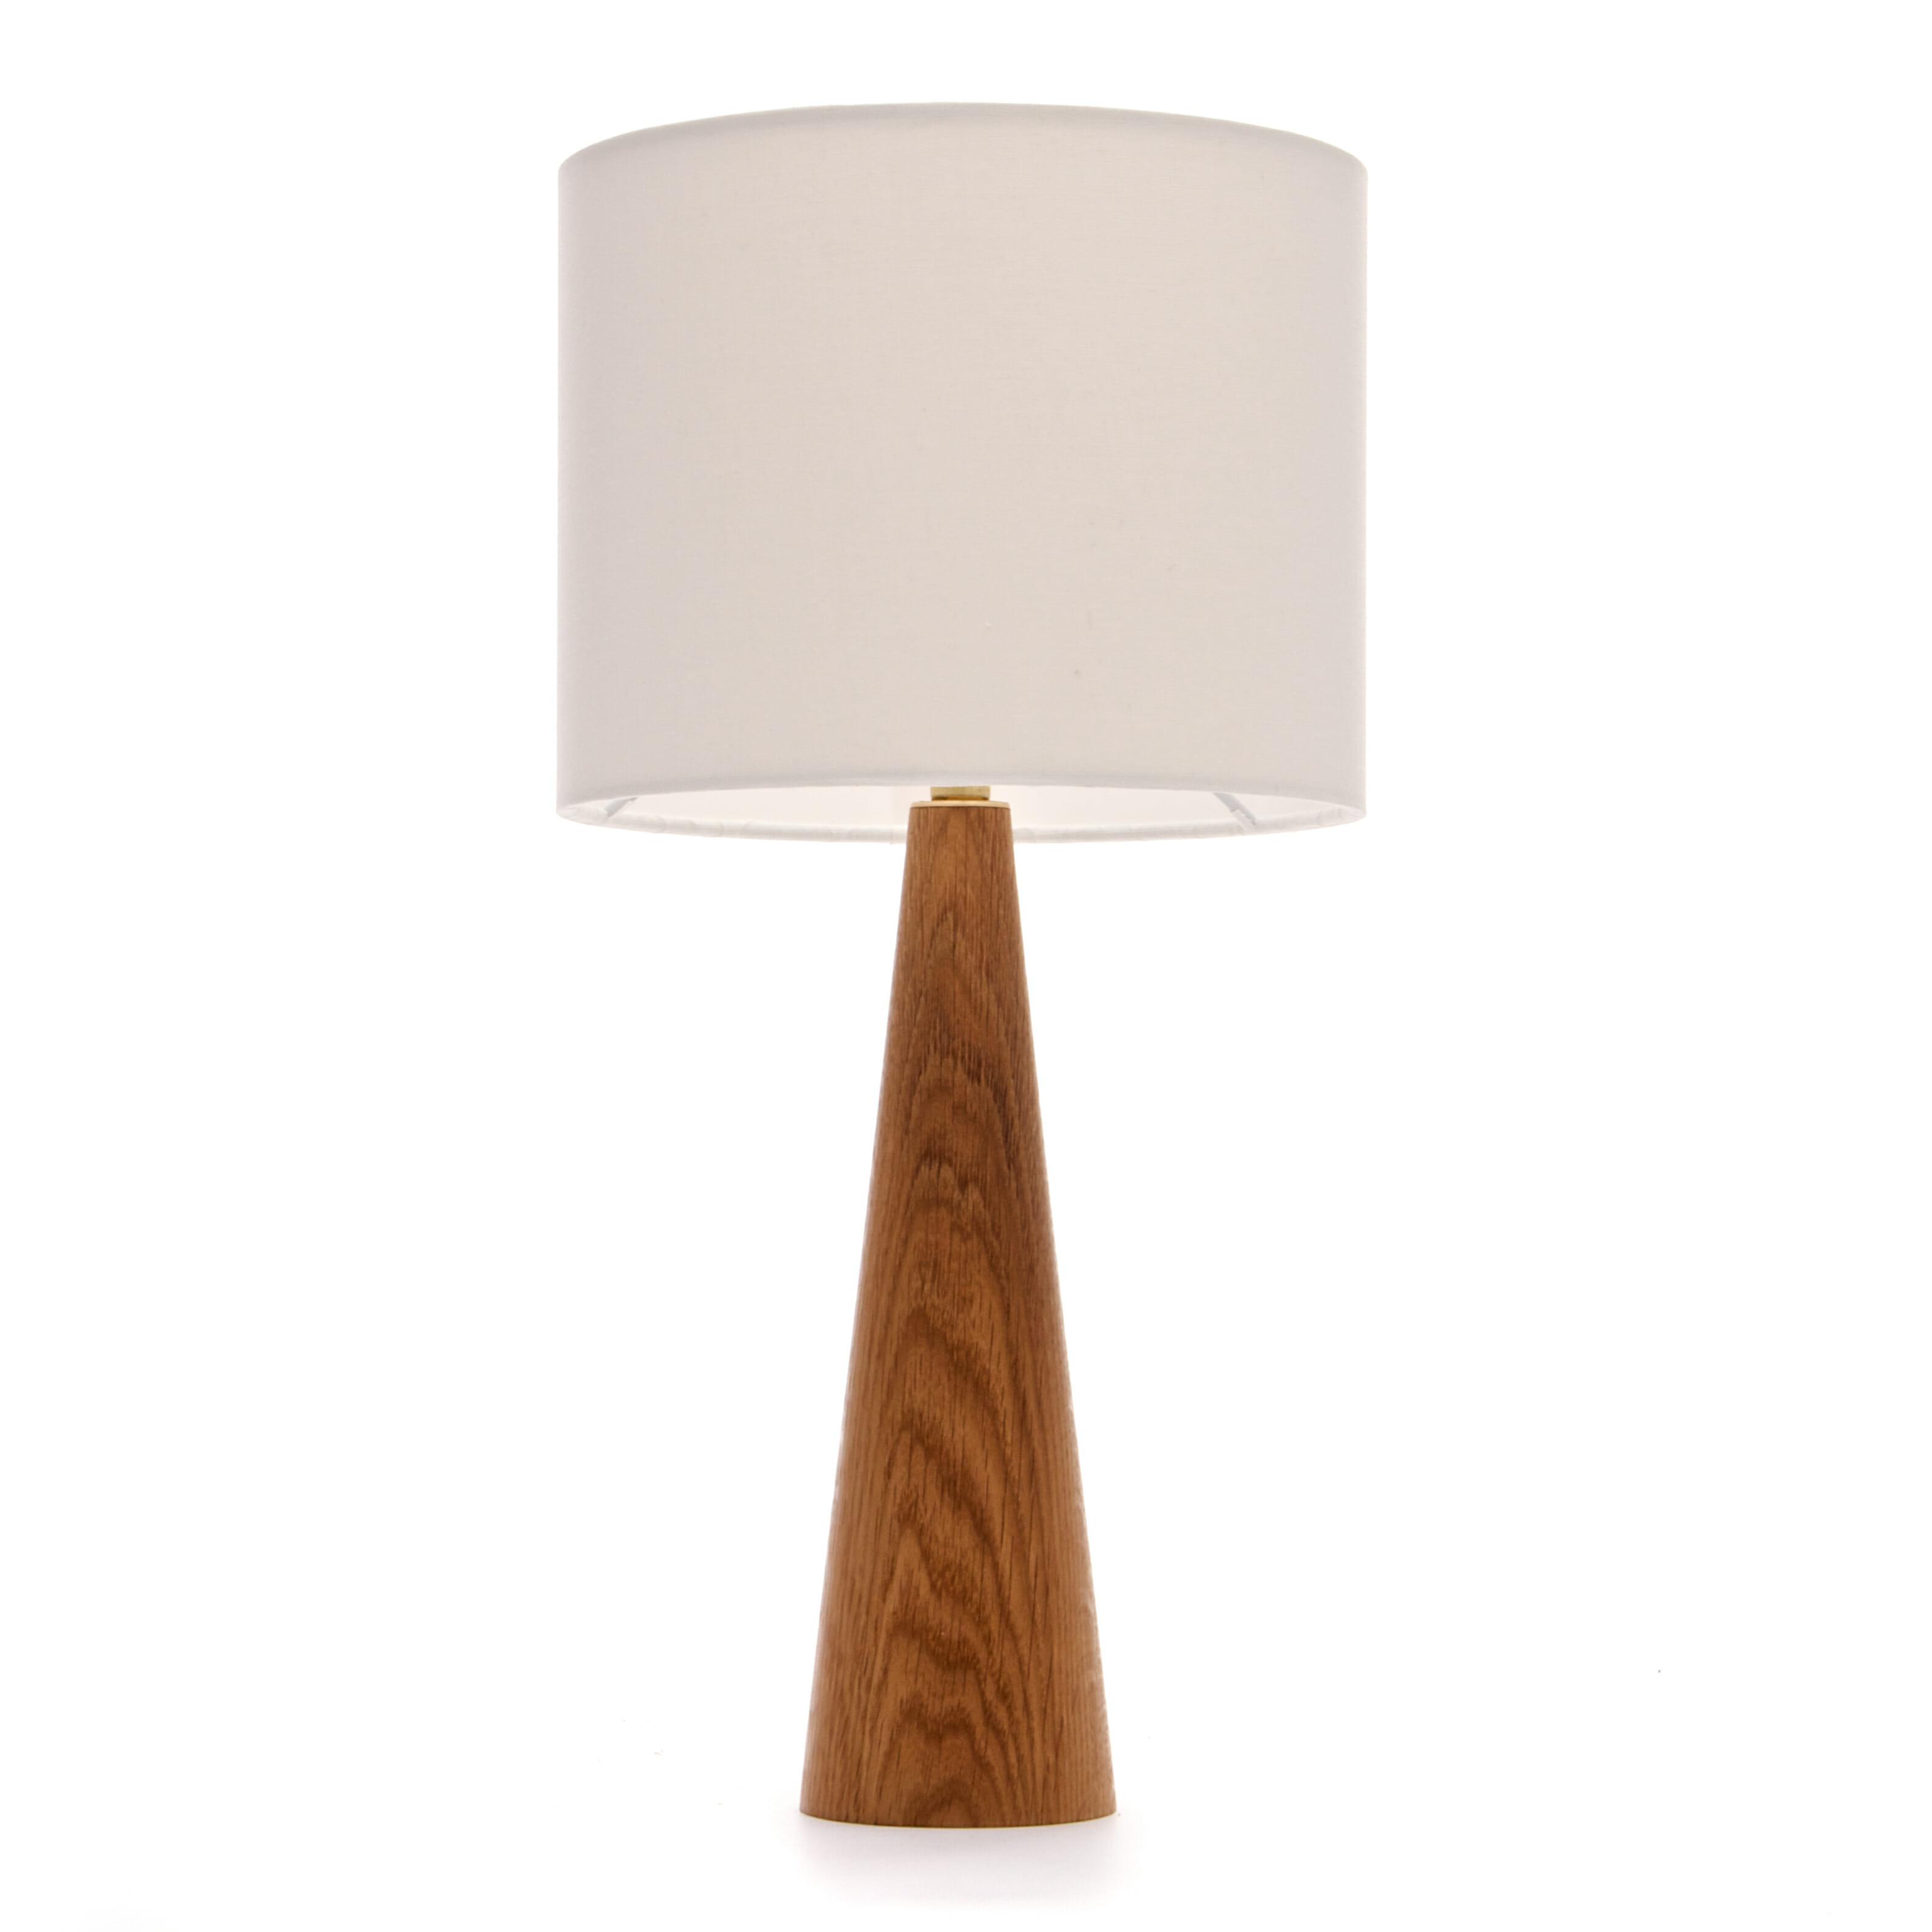 Oak Cone Bedside Table Lamp Wooden Bedside Table Lamp